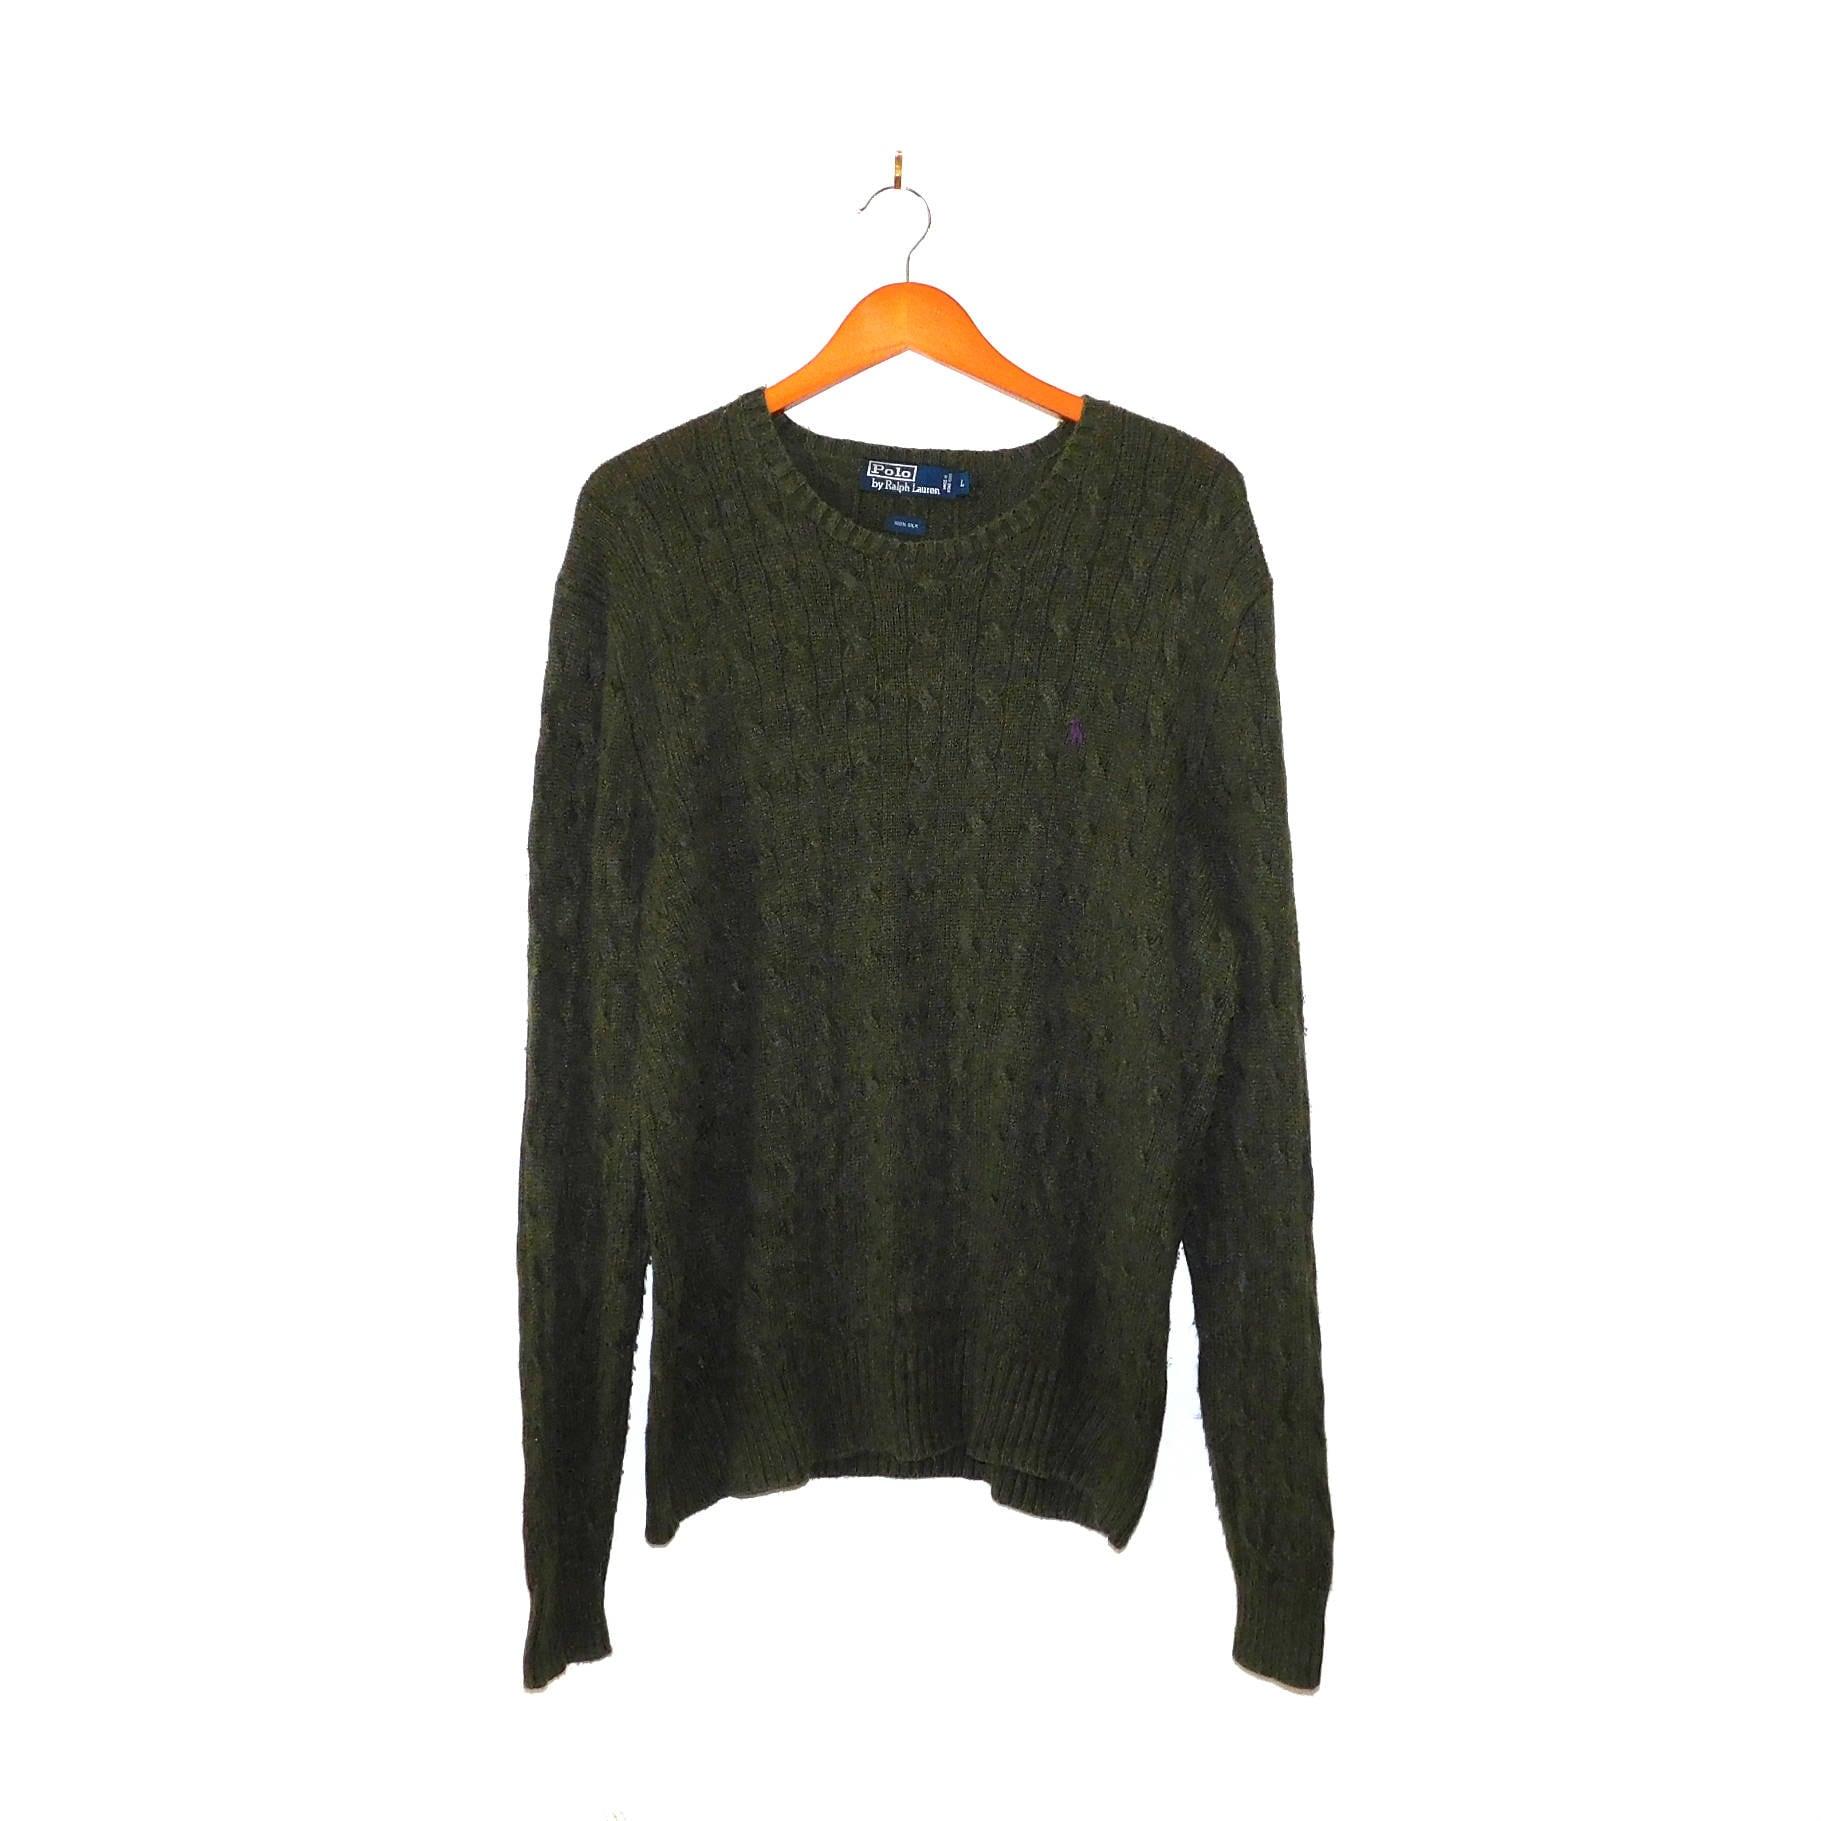 Knit Pullover Green Polo Ralph Lauren Sweater Dark Large Tu1lFJcK3